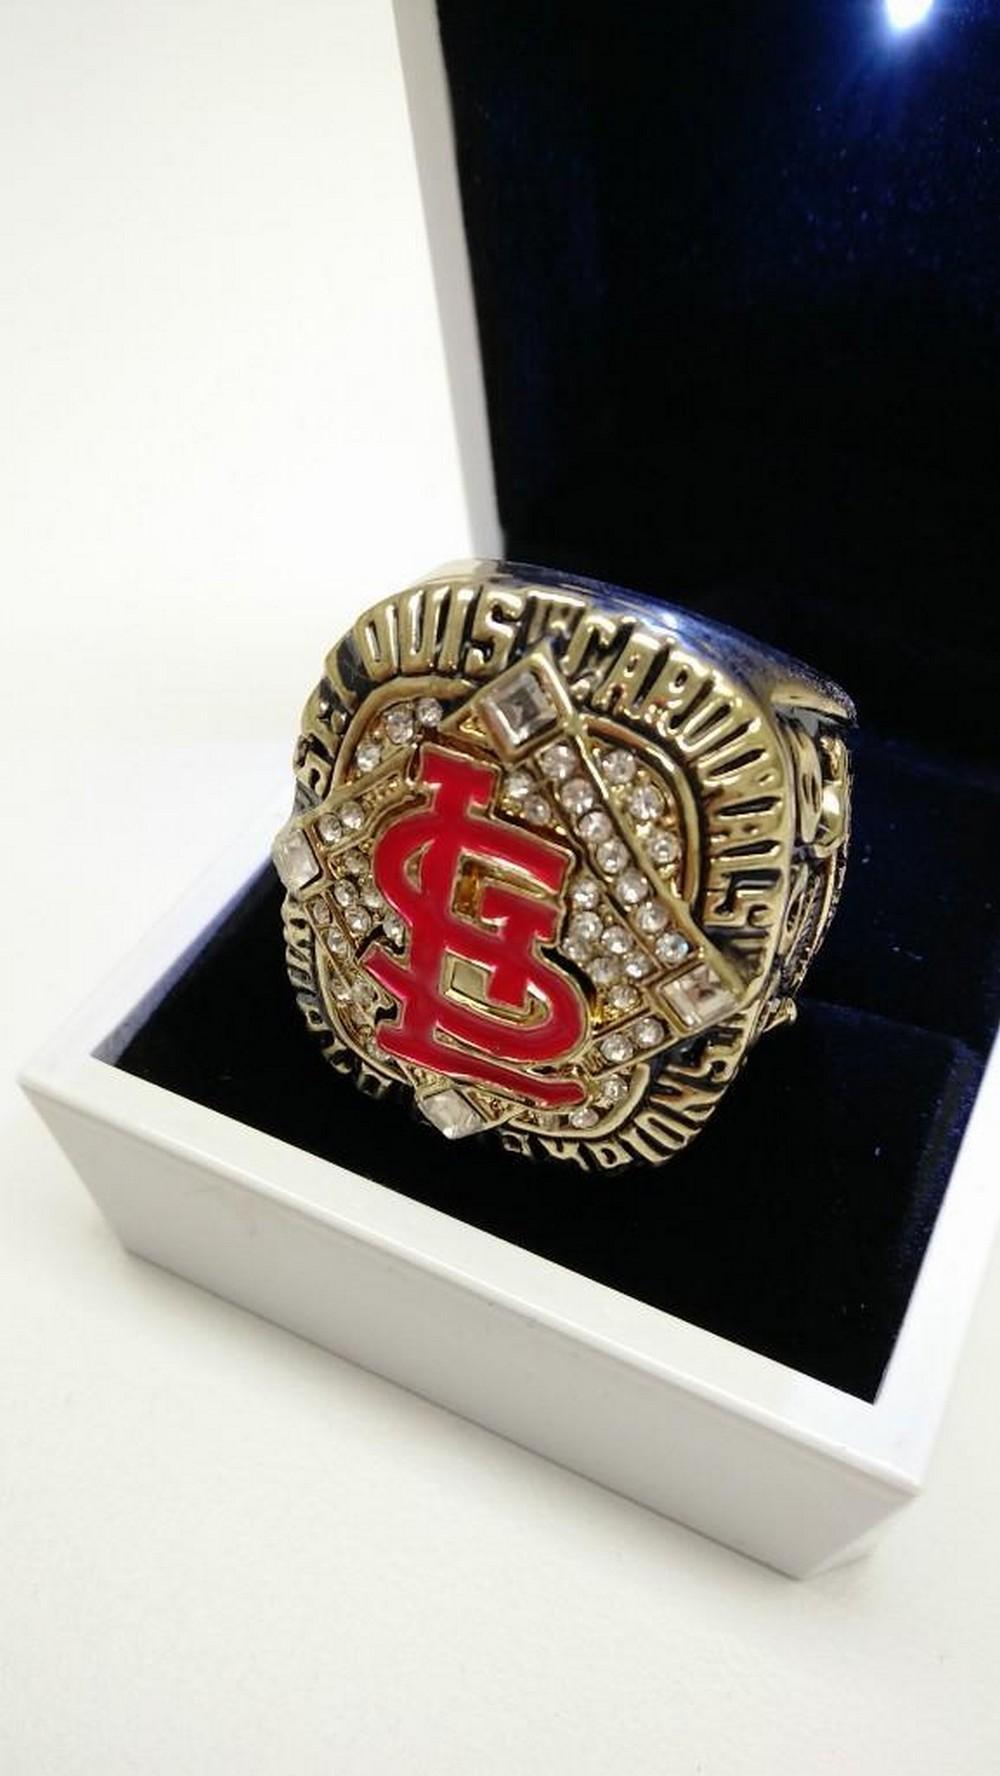 St. Louis Cardinals 2006 Championship Ring